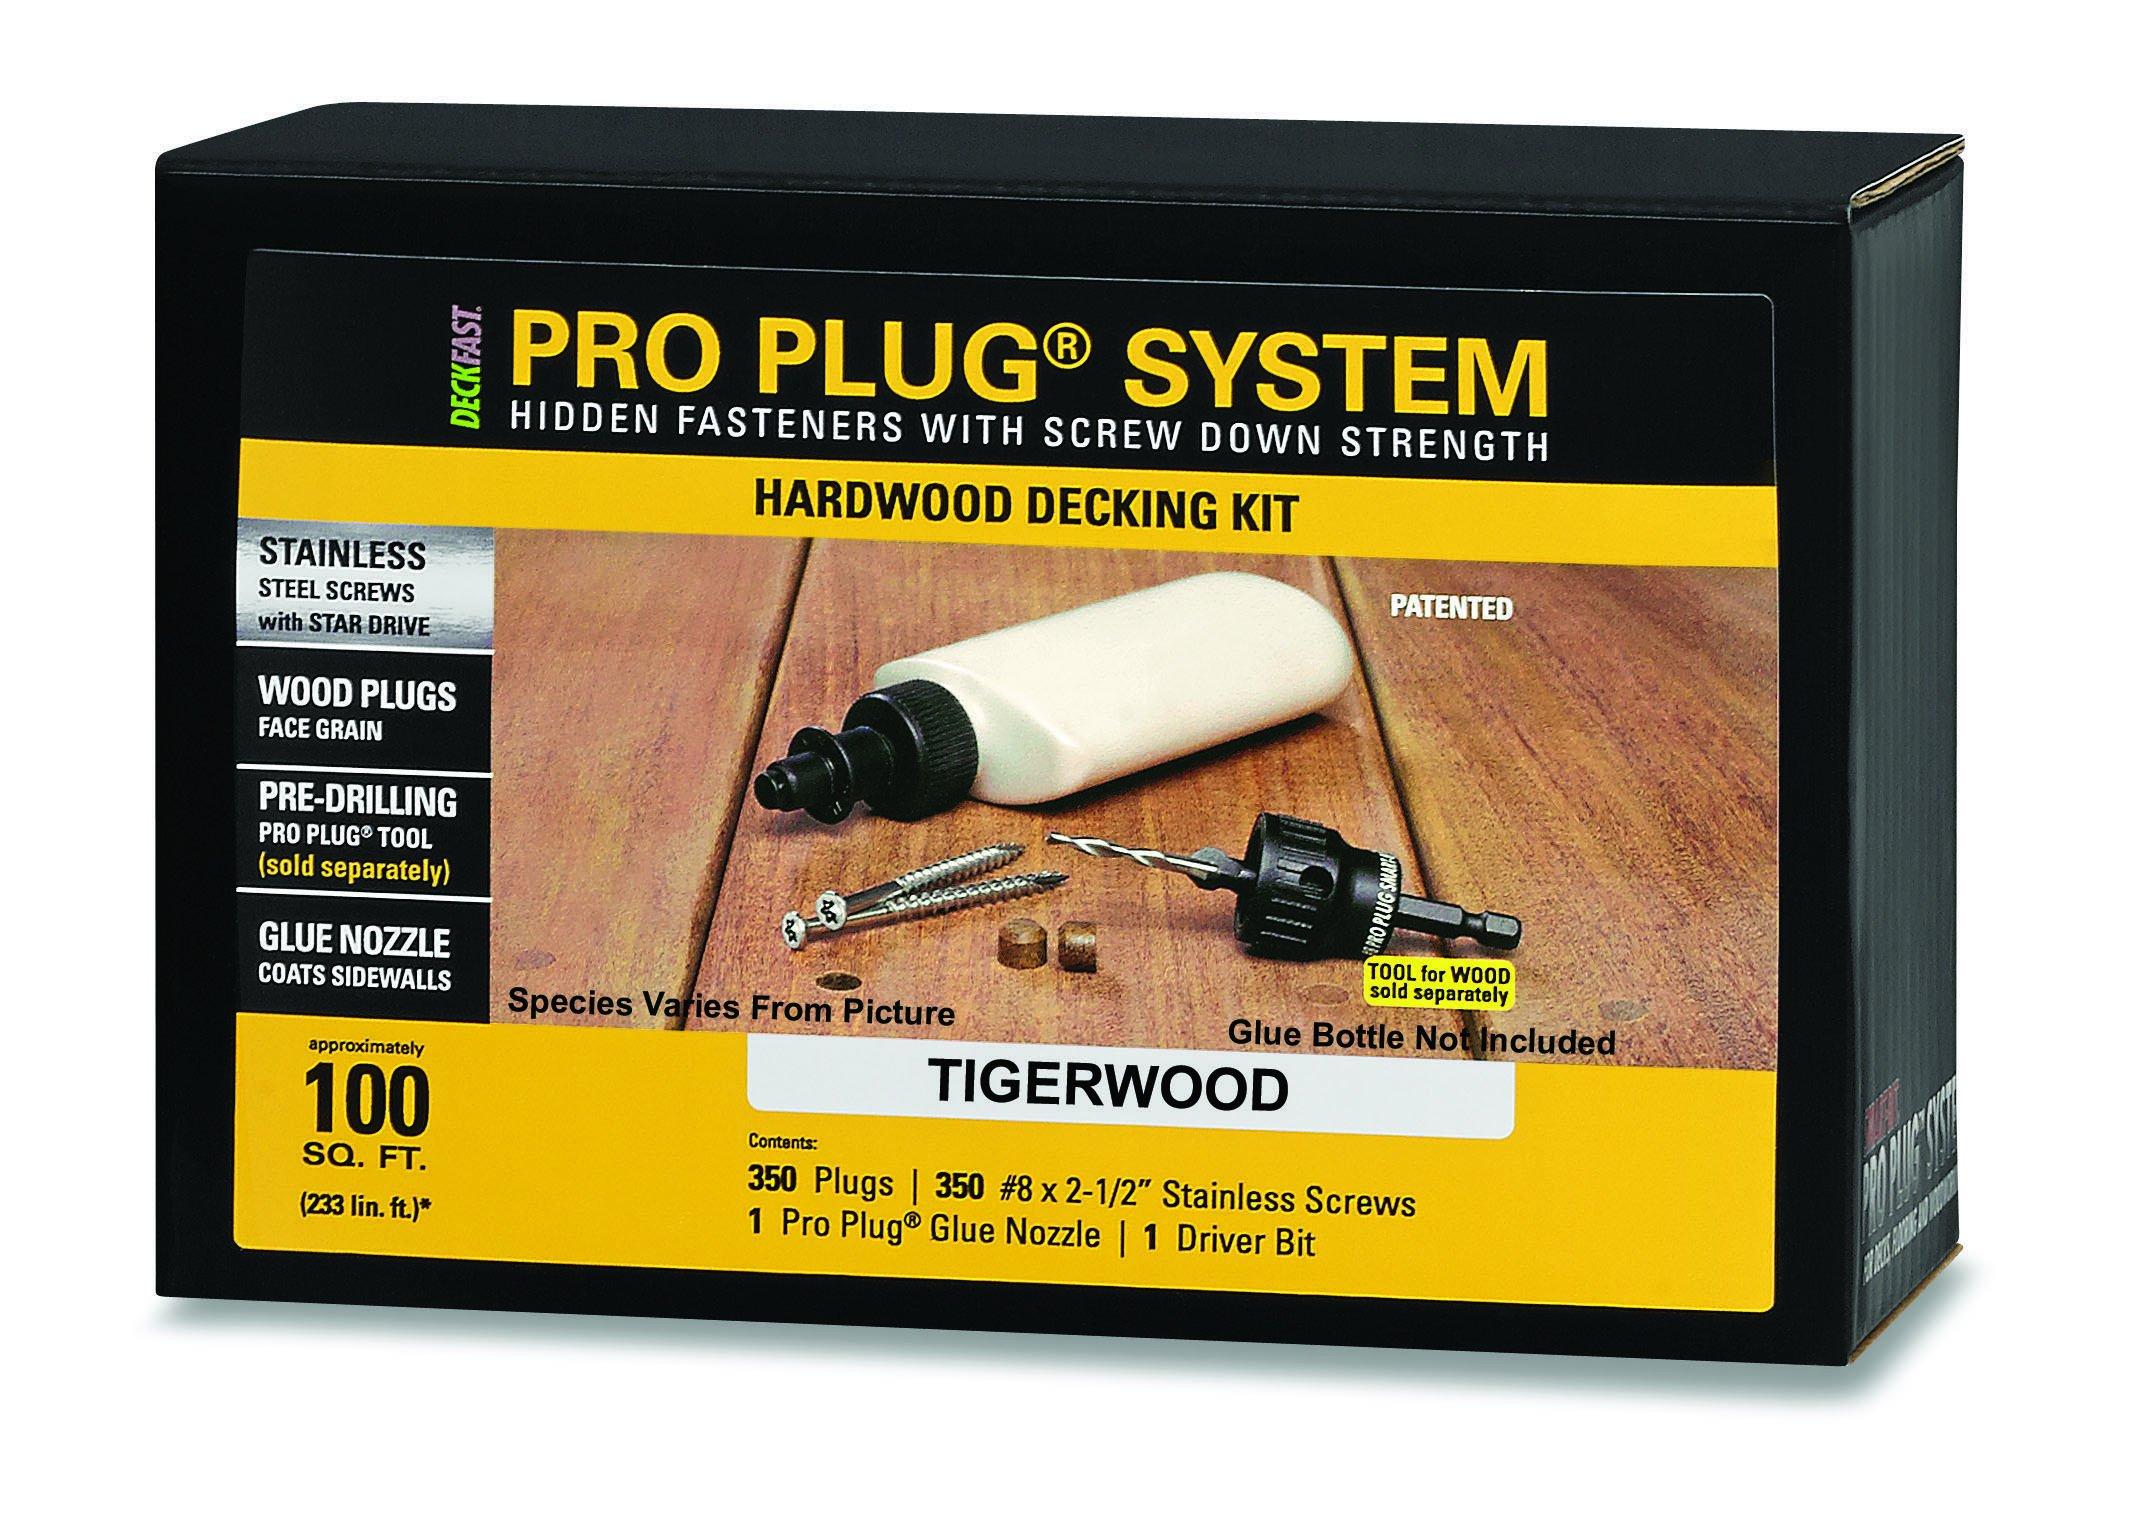 PRO-PLUG SYSTEM for Hardwoods - 350 pc Kit for 100 Sq. Ft. - Tiger Wood plugs 5/16'' diameter